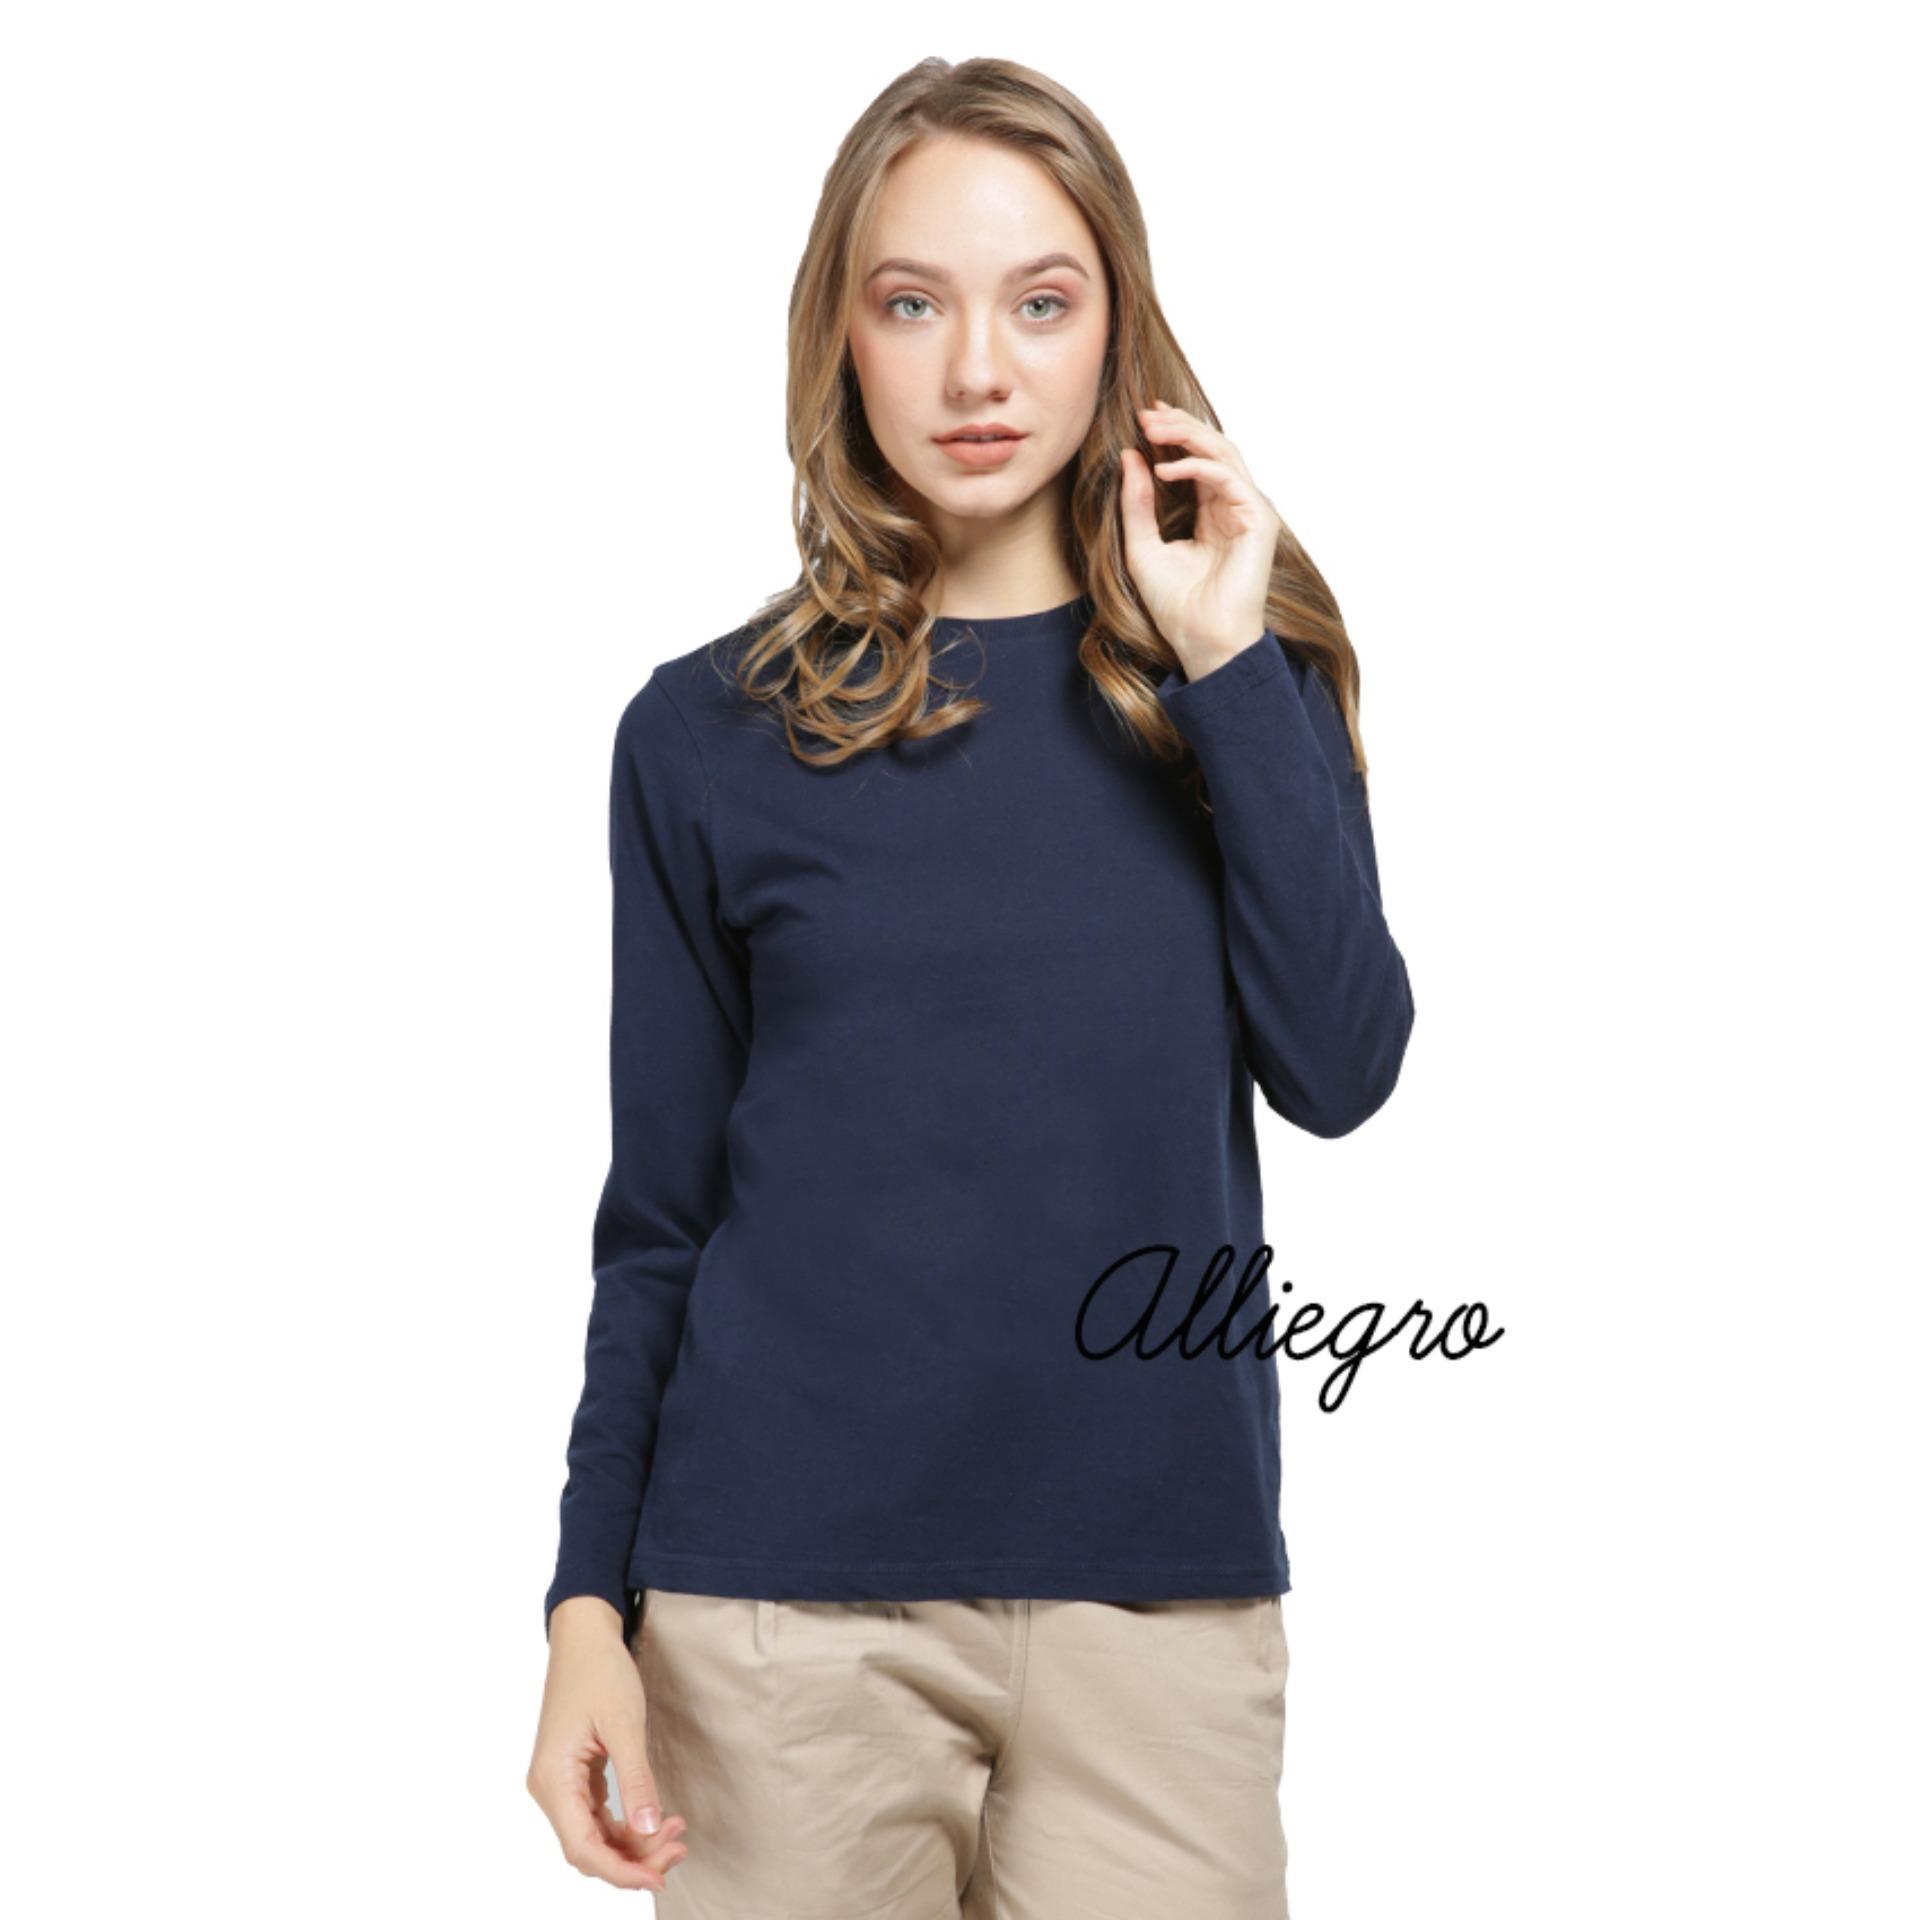 Alliegro Kaos Polos Wanita Lengan Panjang Navy - T-Shirt Kaos Distro Cewek Tumblr Tee Premium Kaos Atasan Wanita Biru Dongker